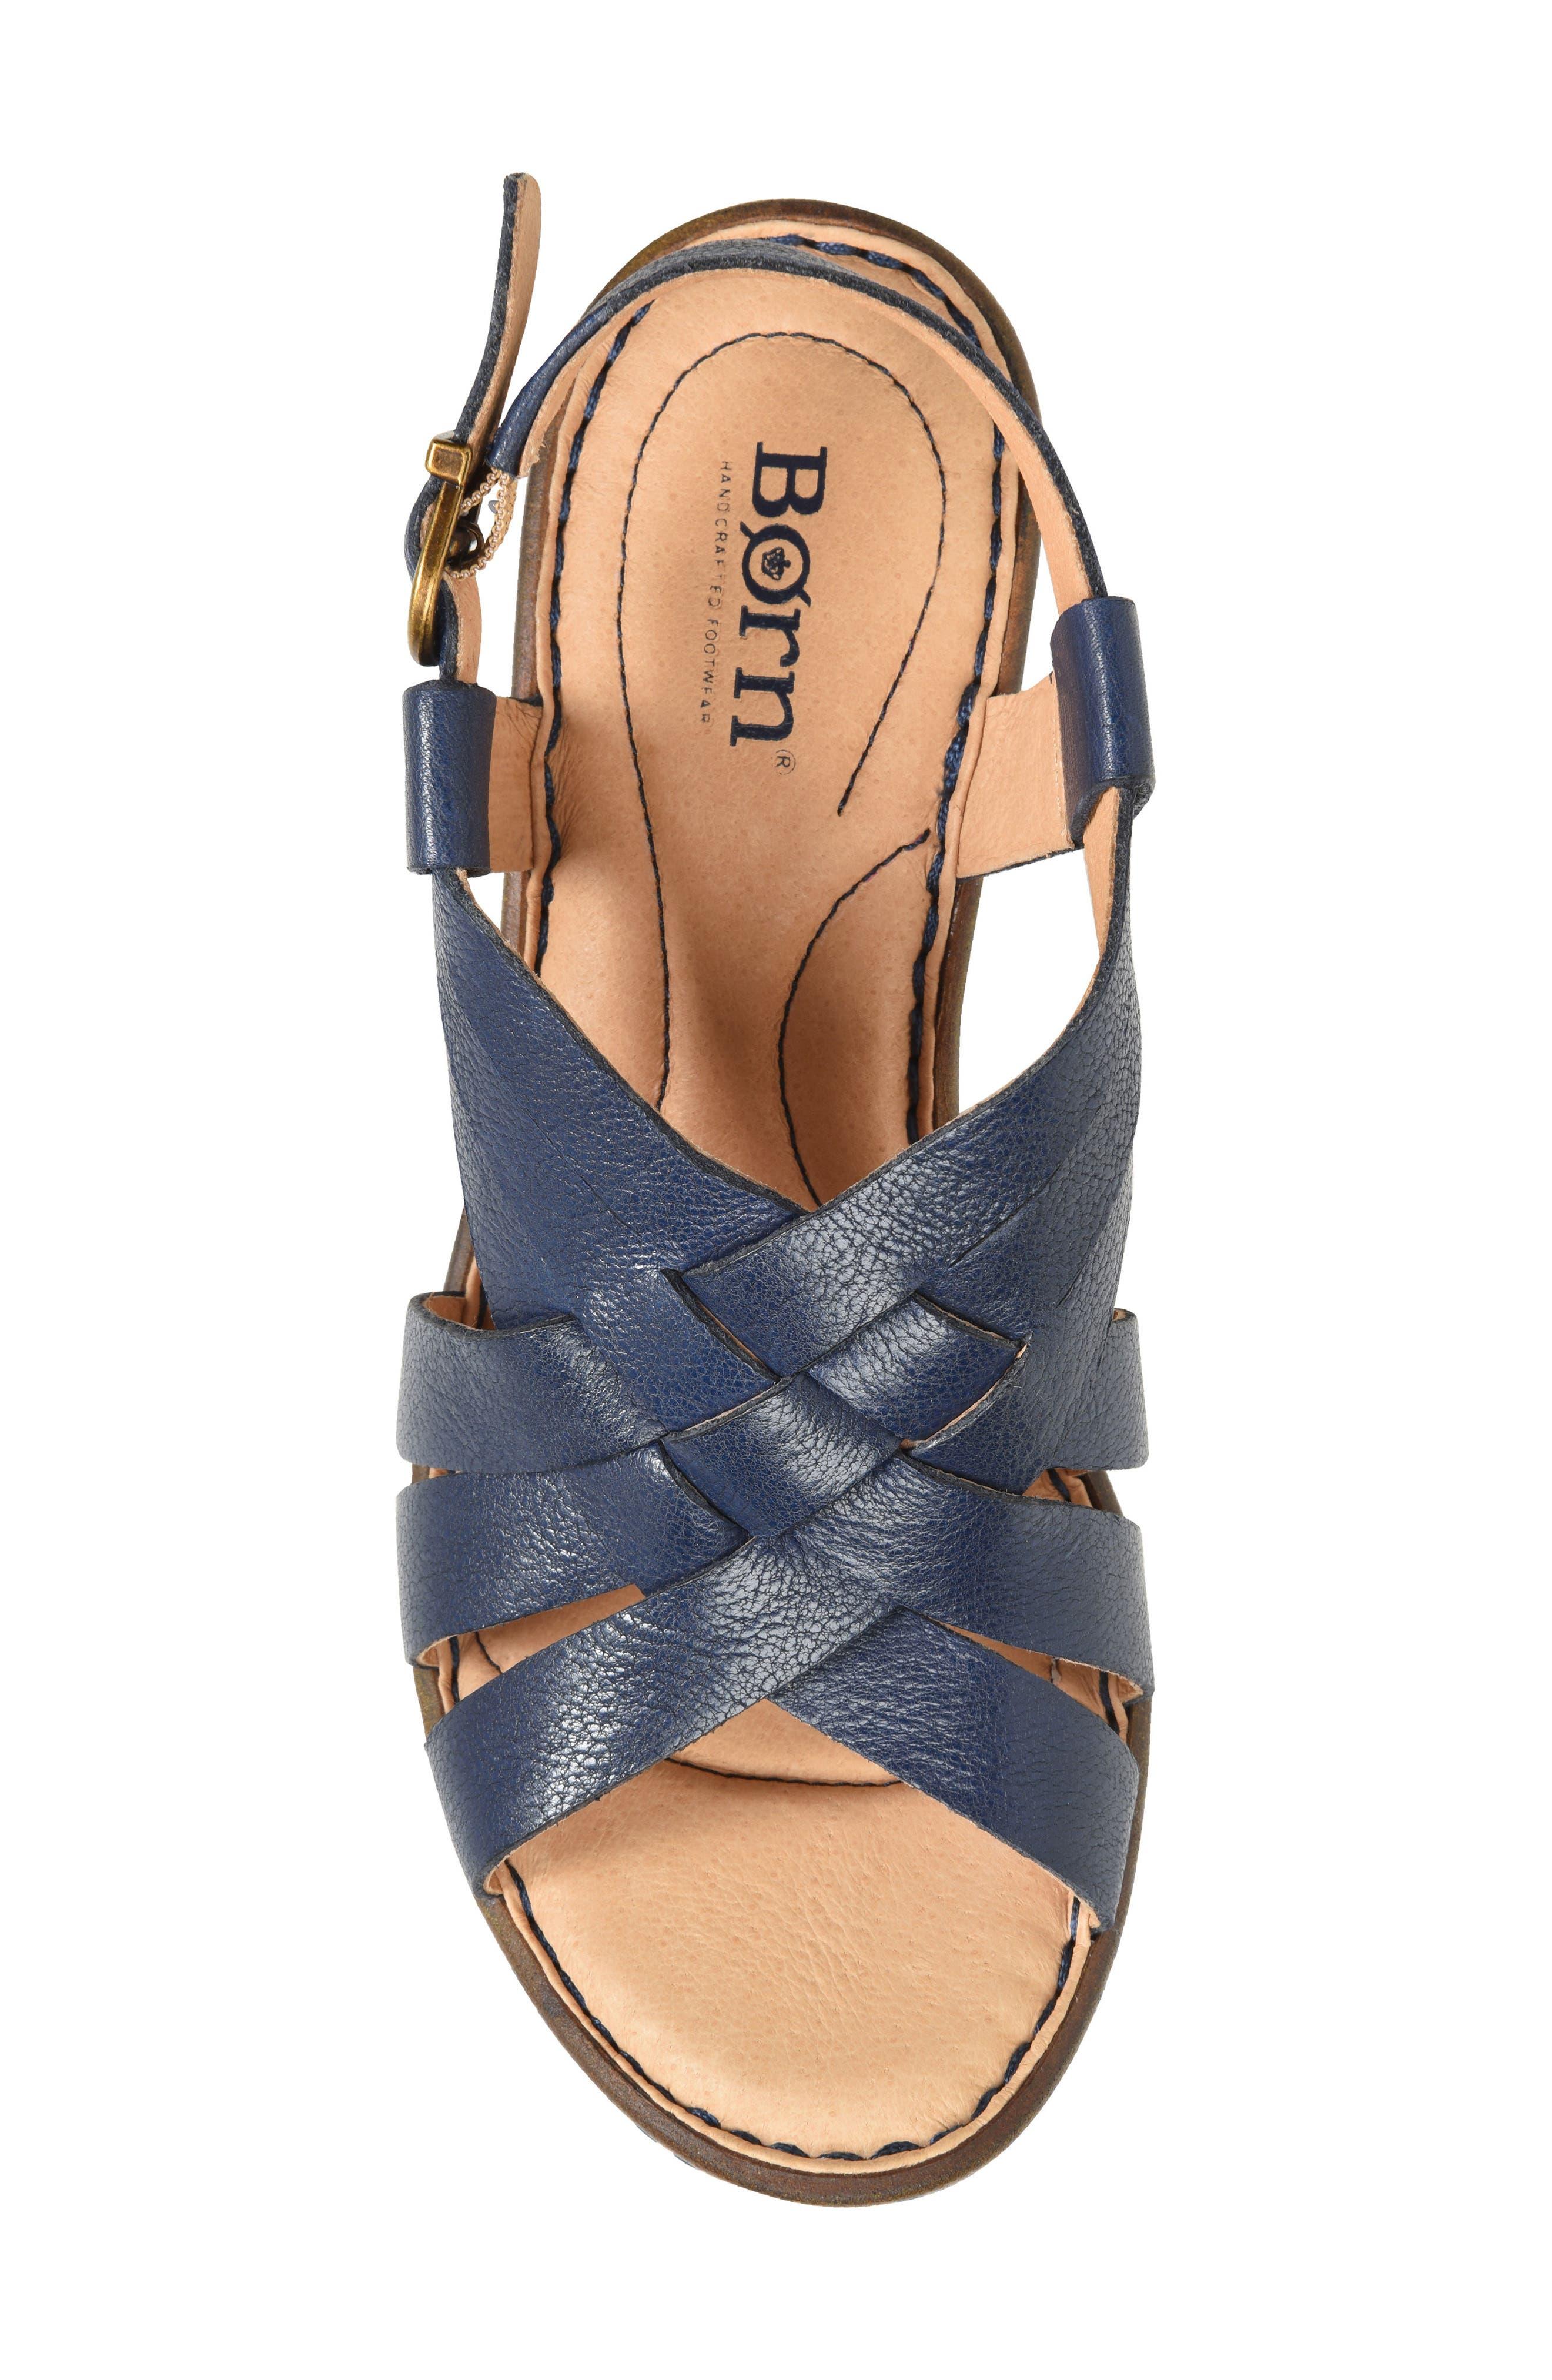 Crevalle Platform Sandal,                             Alternate thumbnail 5, color,                             Navy Leather